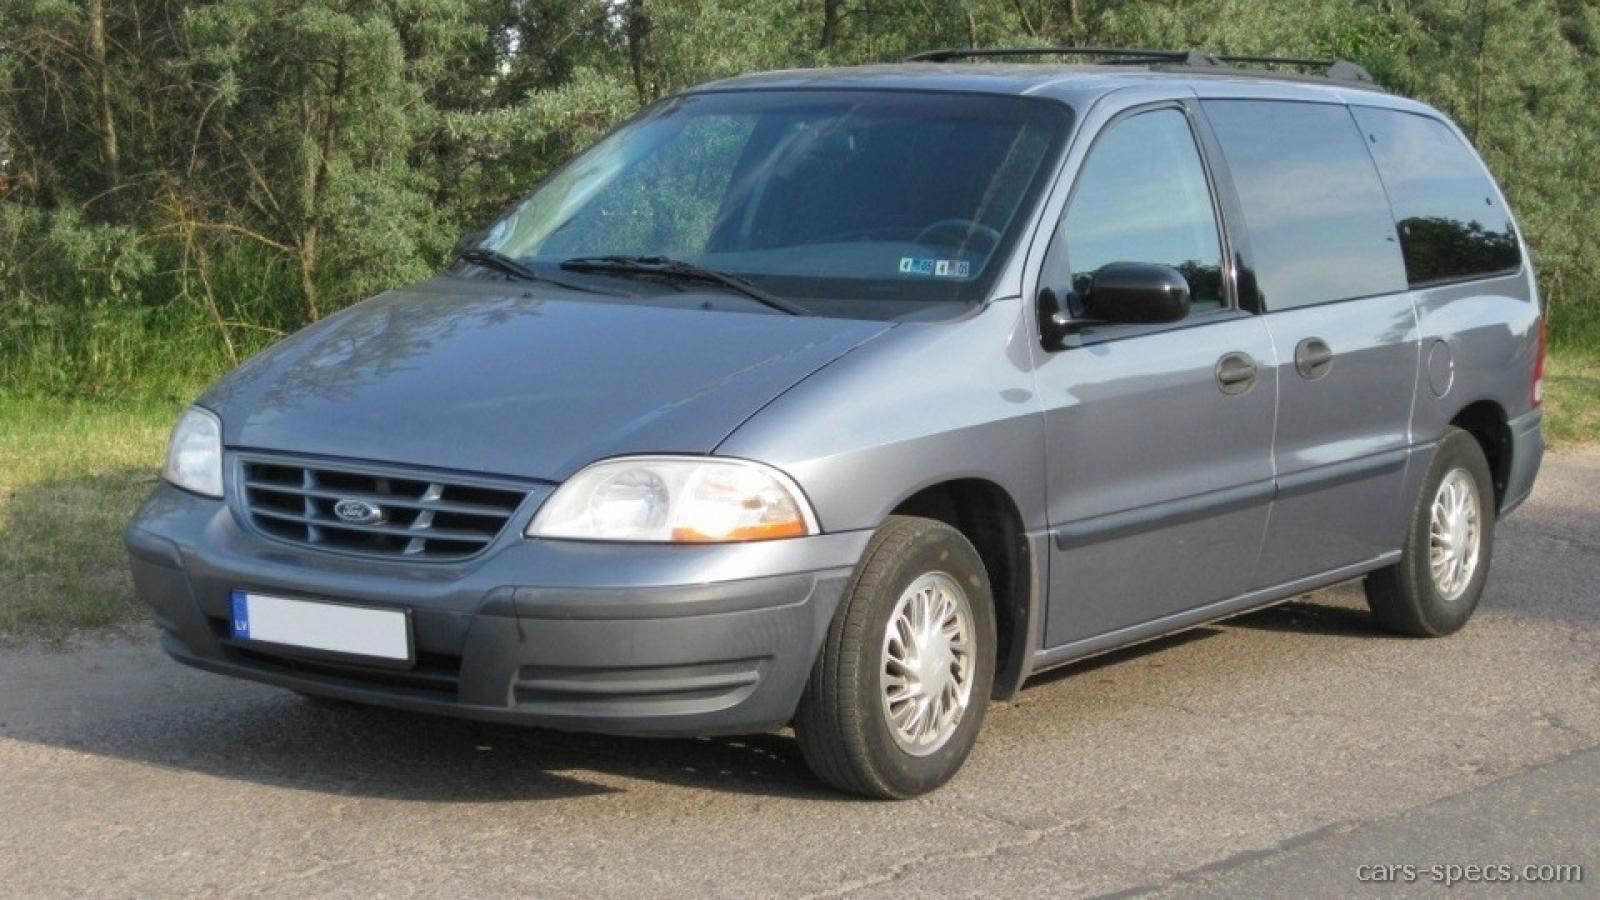 800 1024 1280 1600 origin 1998 ford windstar